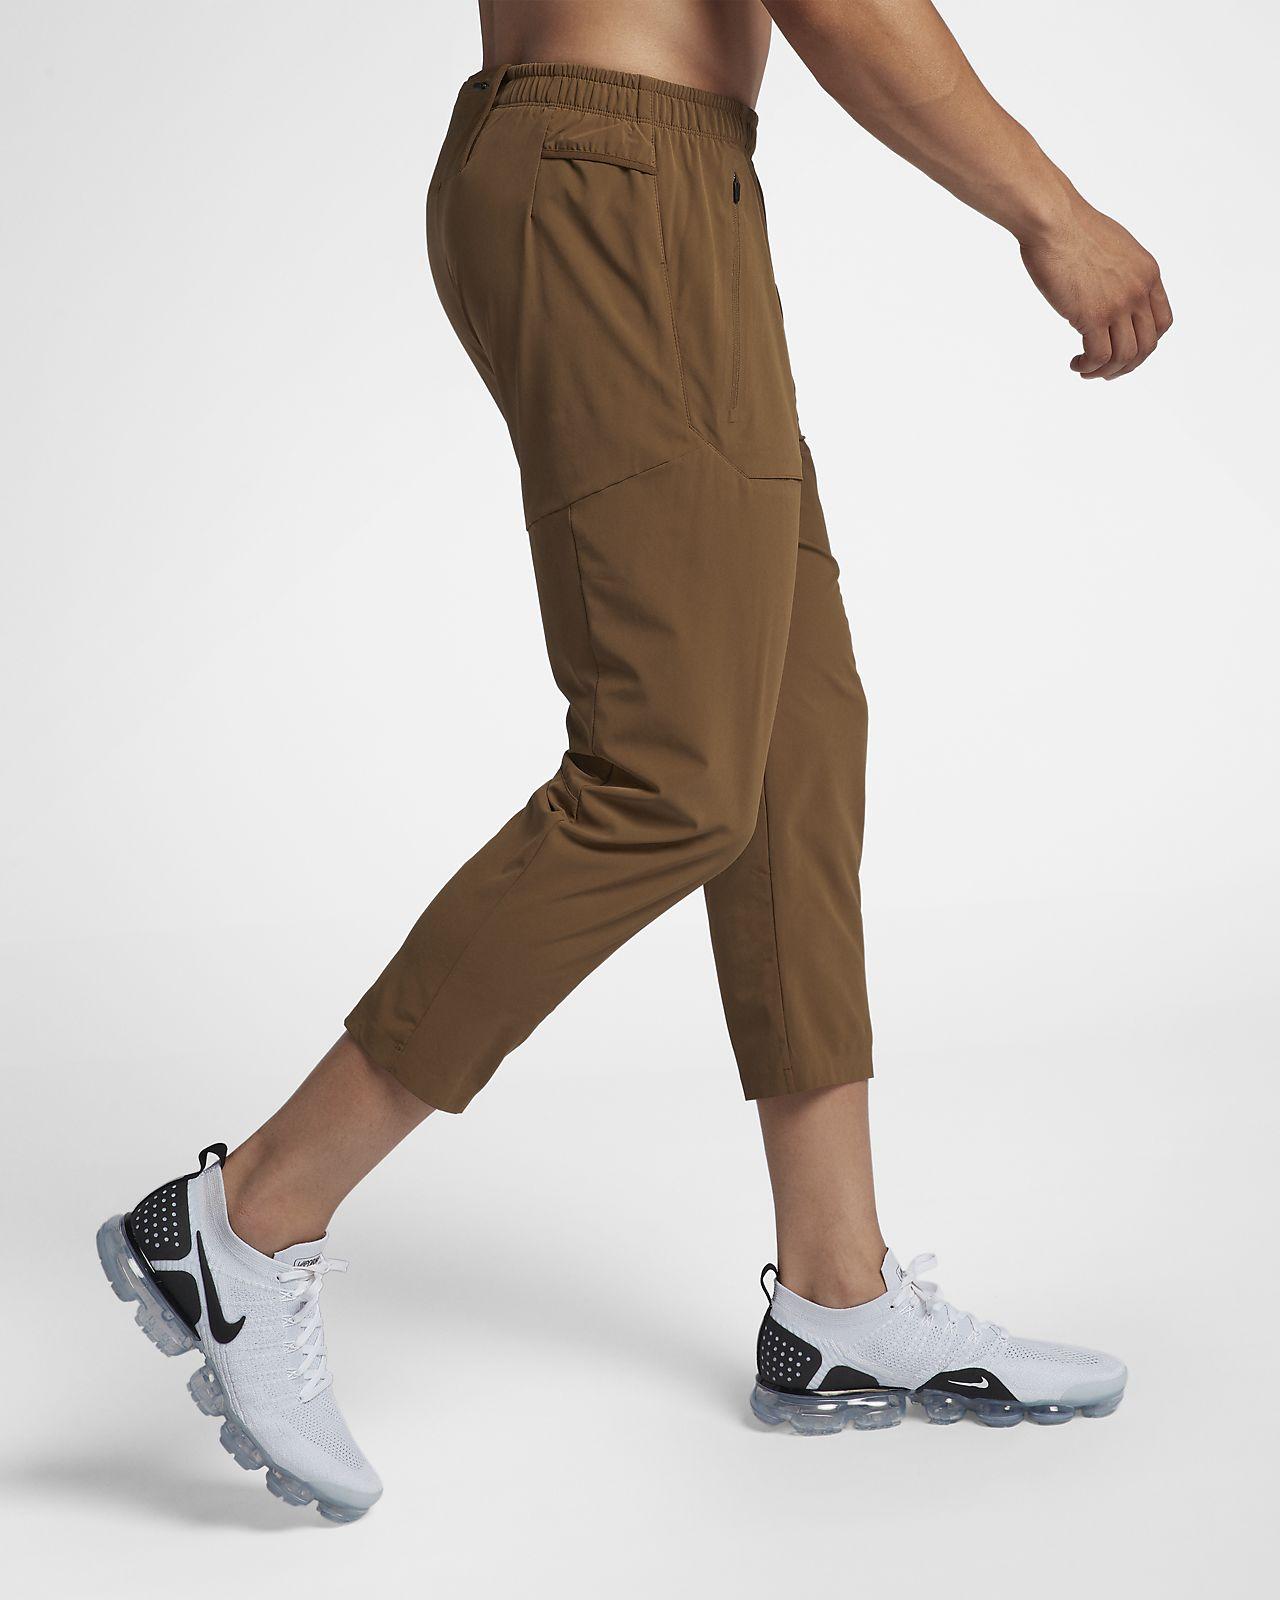 pantaloni nike corsa